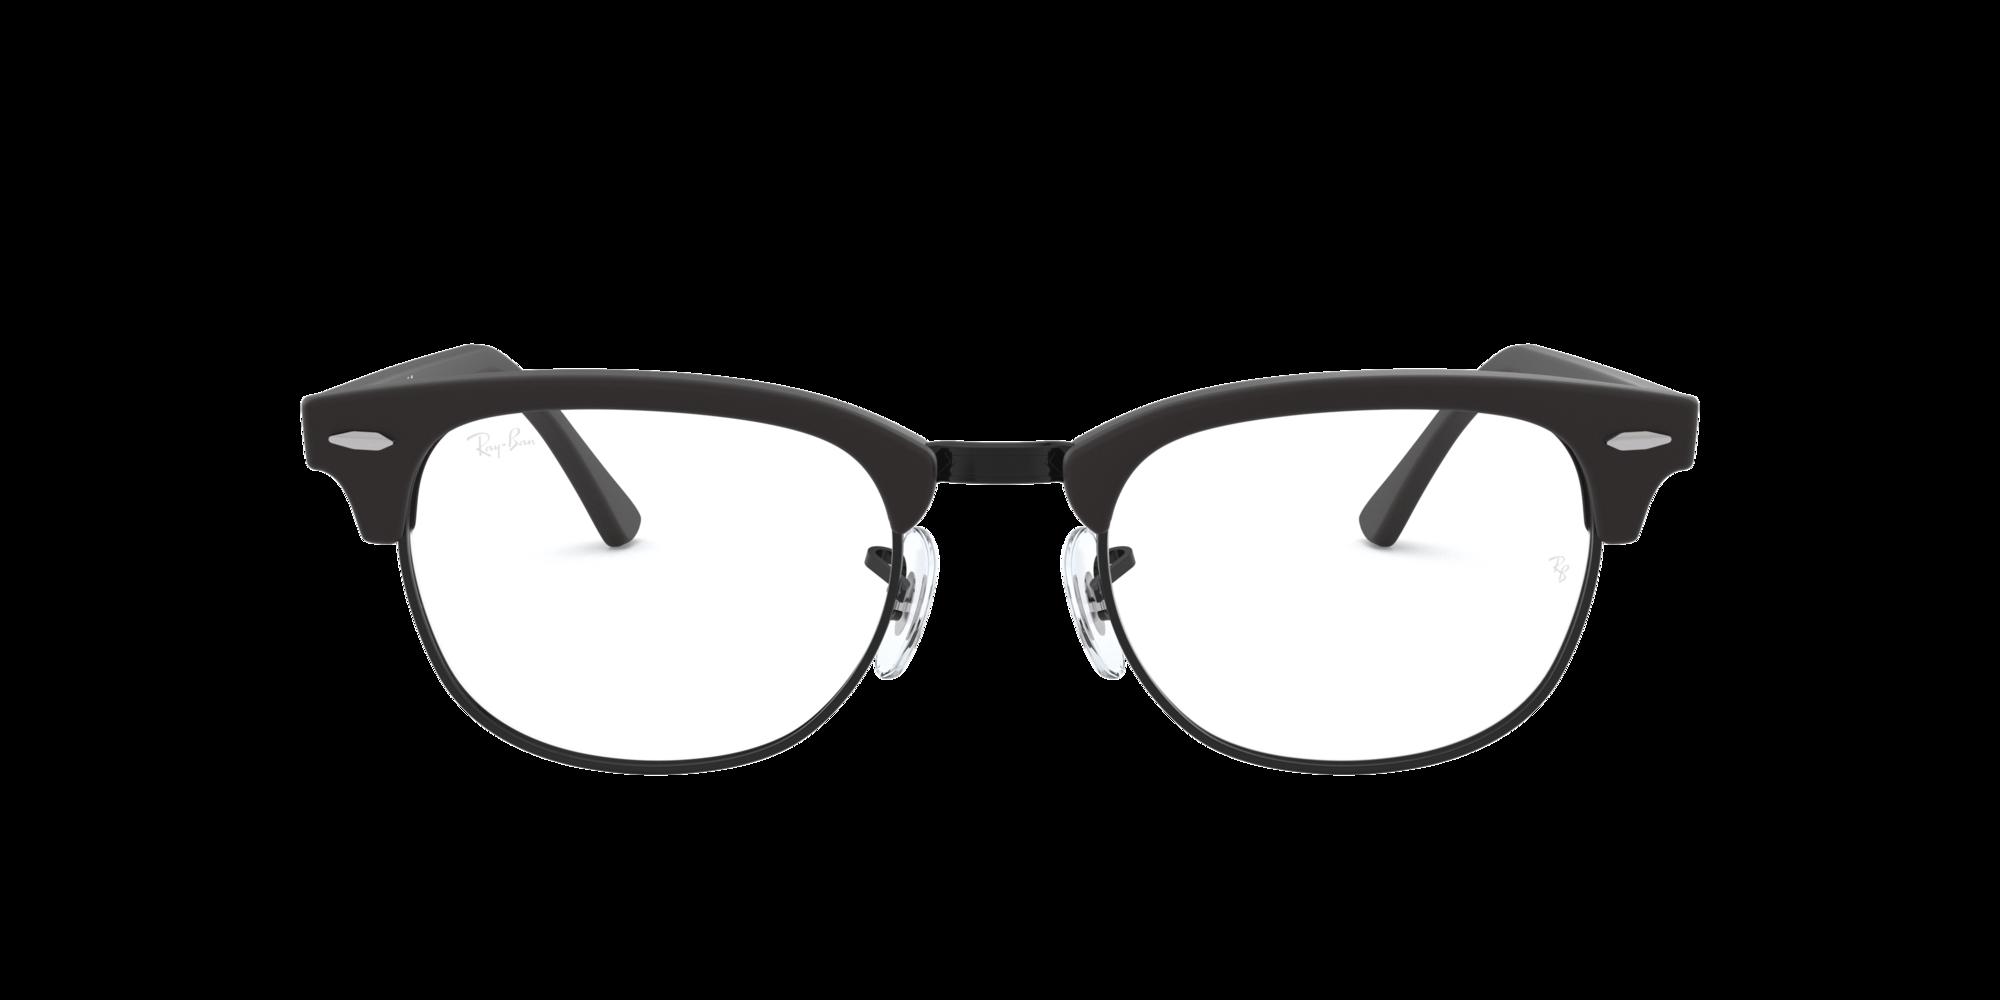 Clubmaster Optics image